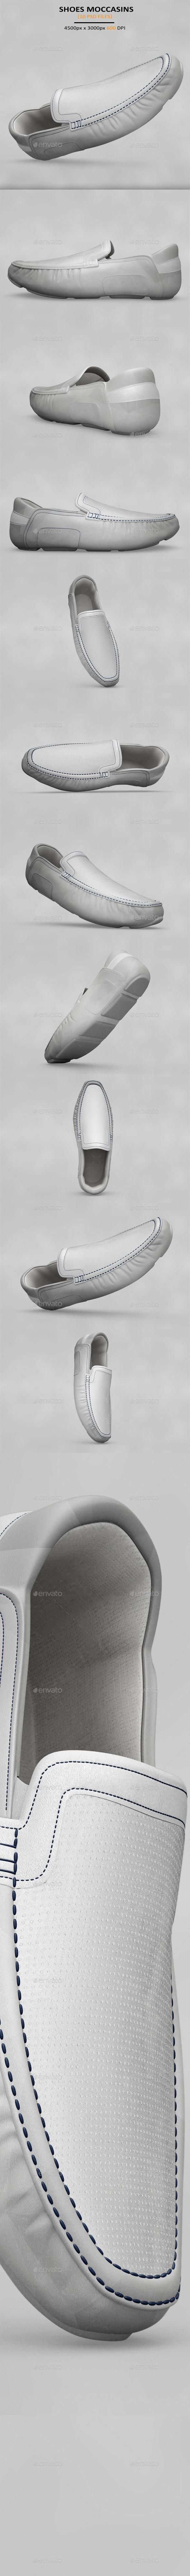 Shoes Moccasins MockUp - Product Mock-Ups Graphics